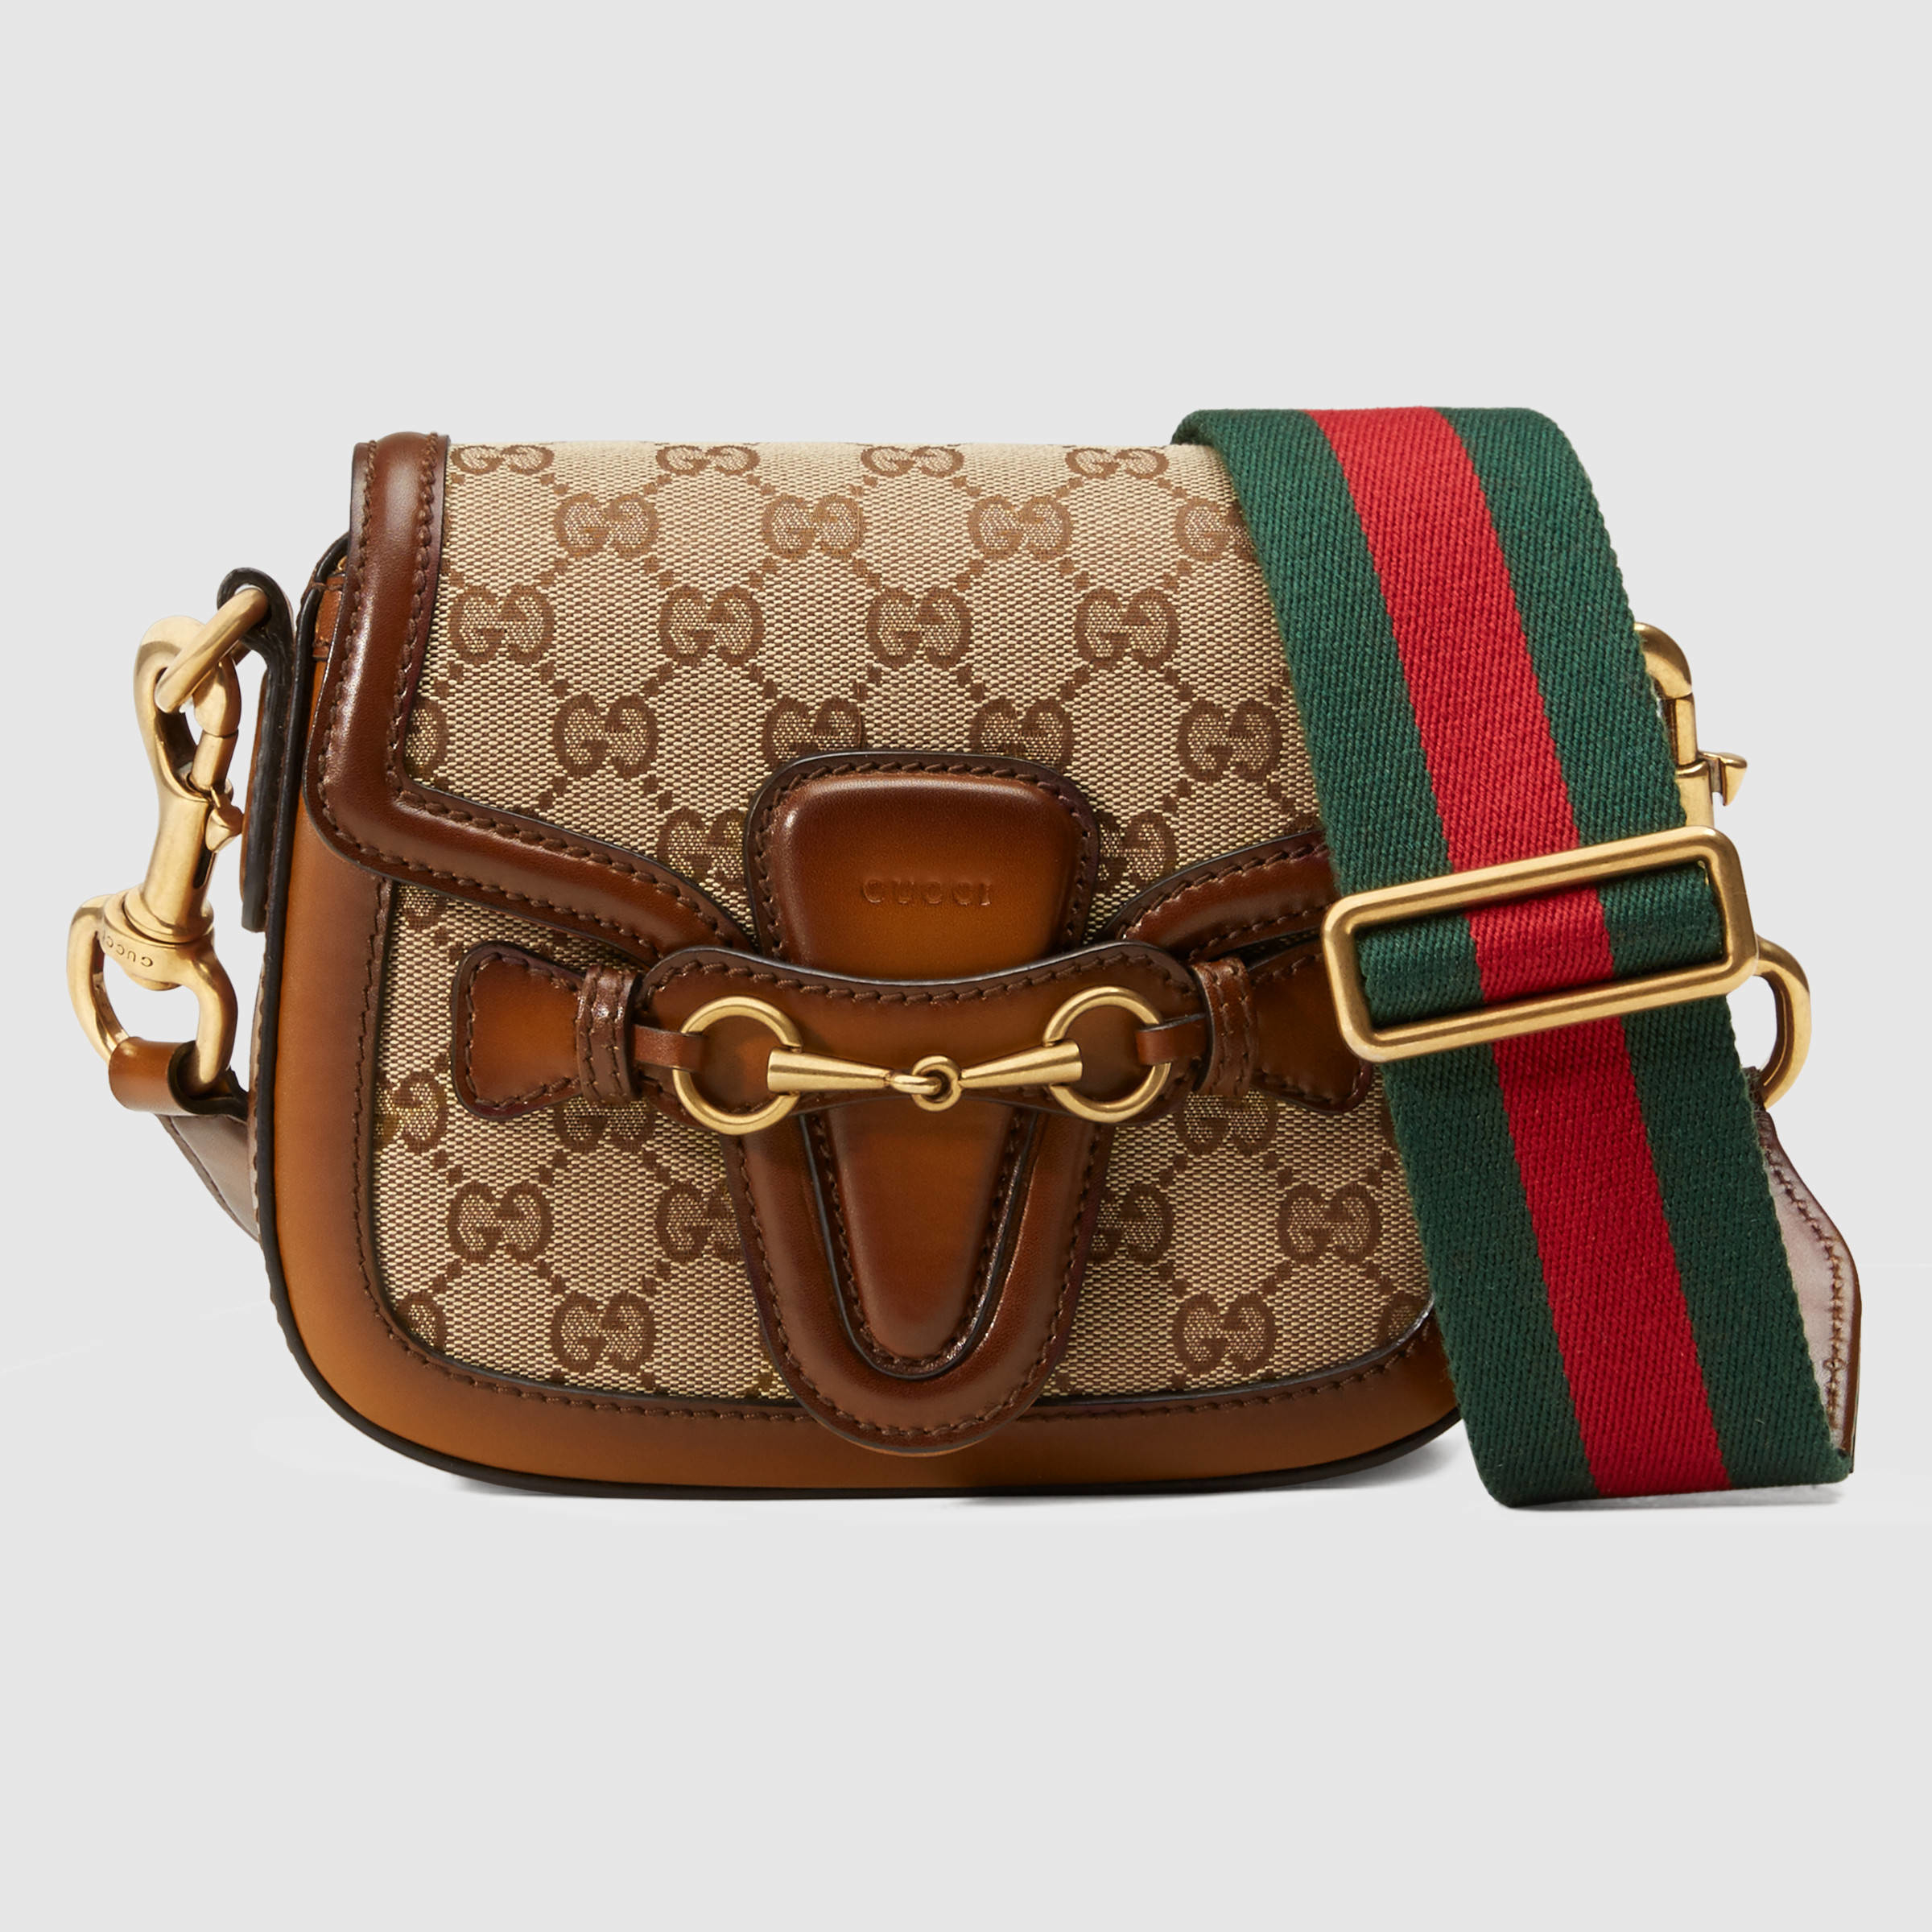 476708d610c16 Lyst - Gucci Lady Web Original Gg Canvas Shoulder Bag in Brown